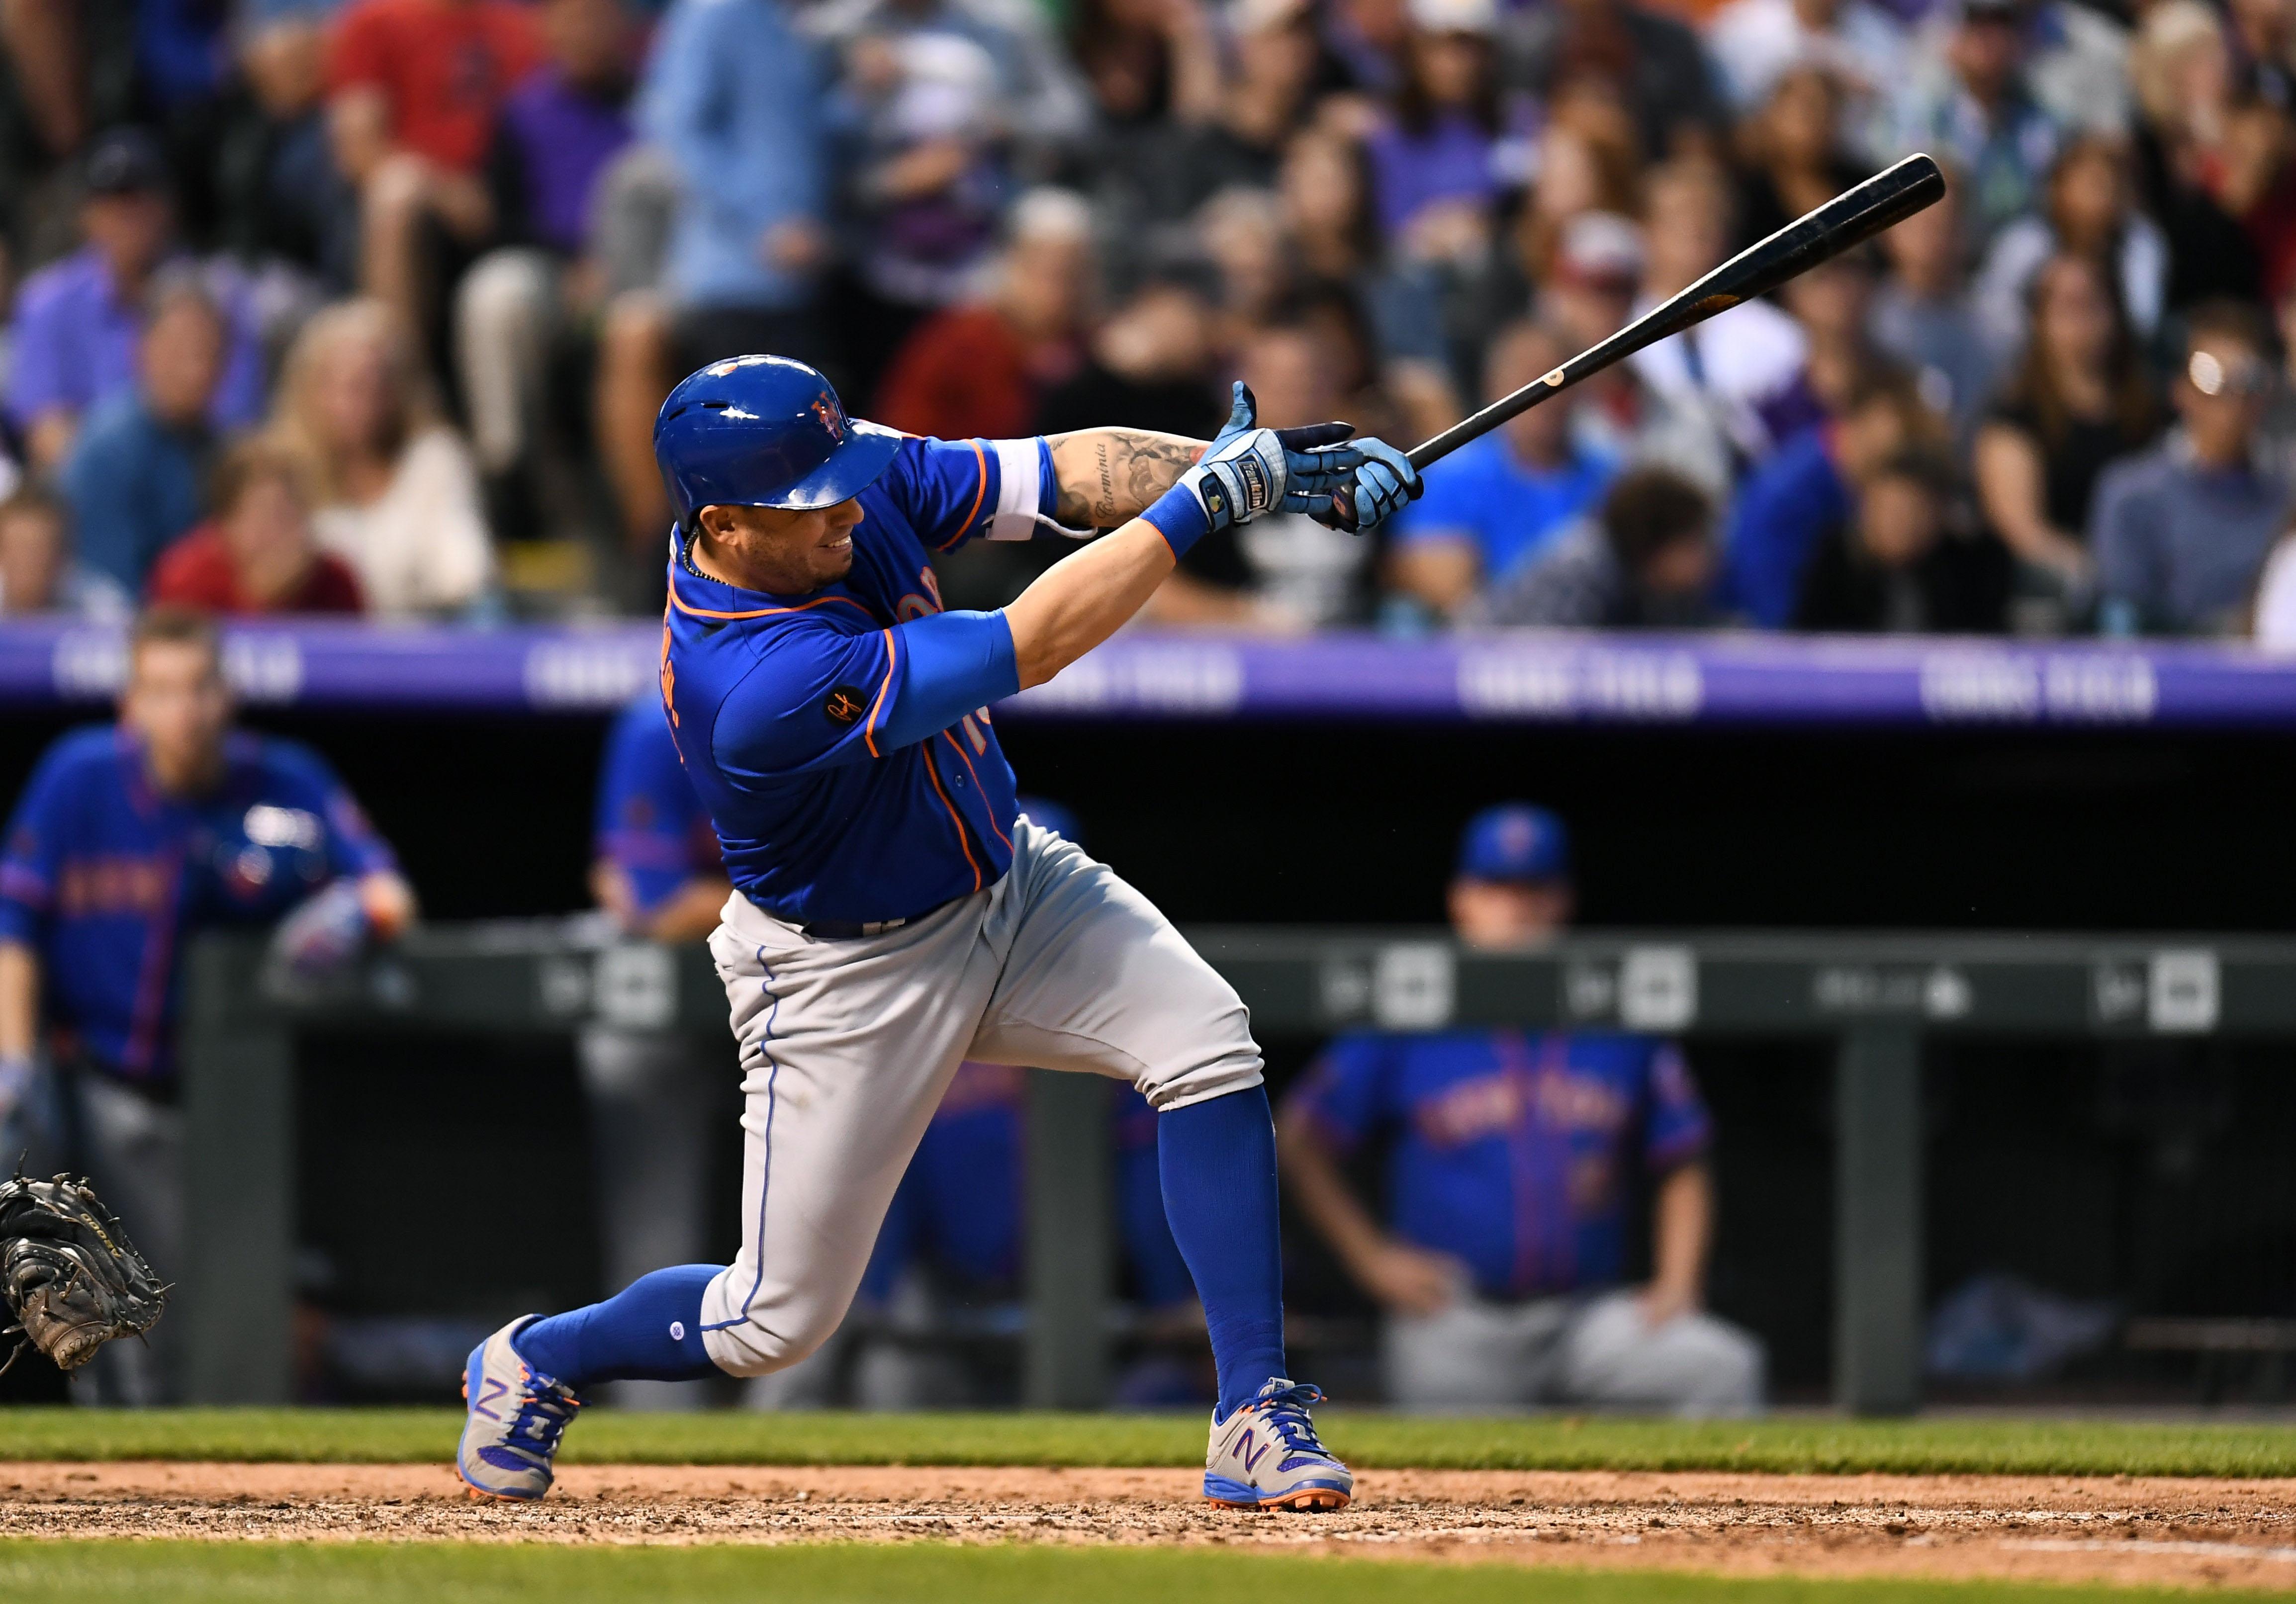 6/21/18 Game Preview: New York Mets at Colorado Rockies